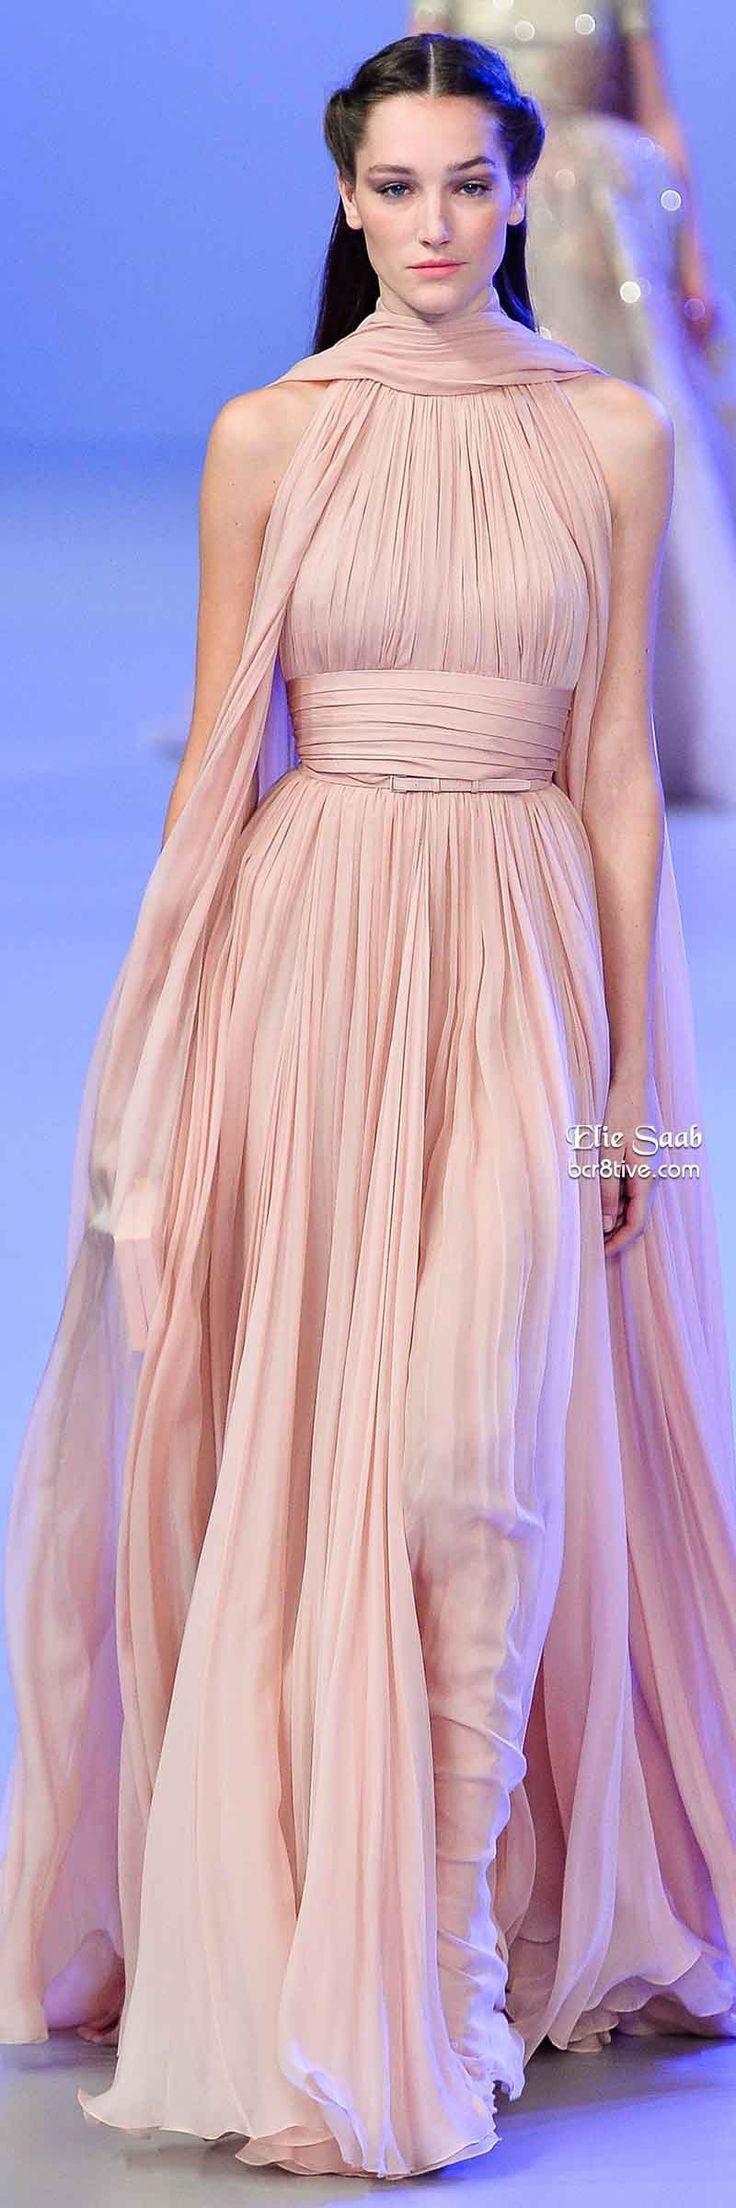 Elie Saab Spring 2014 Couture: